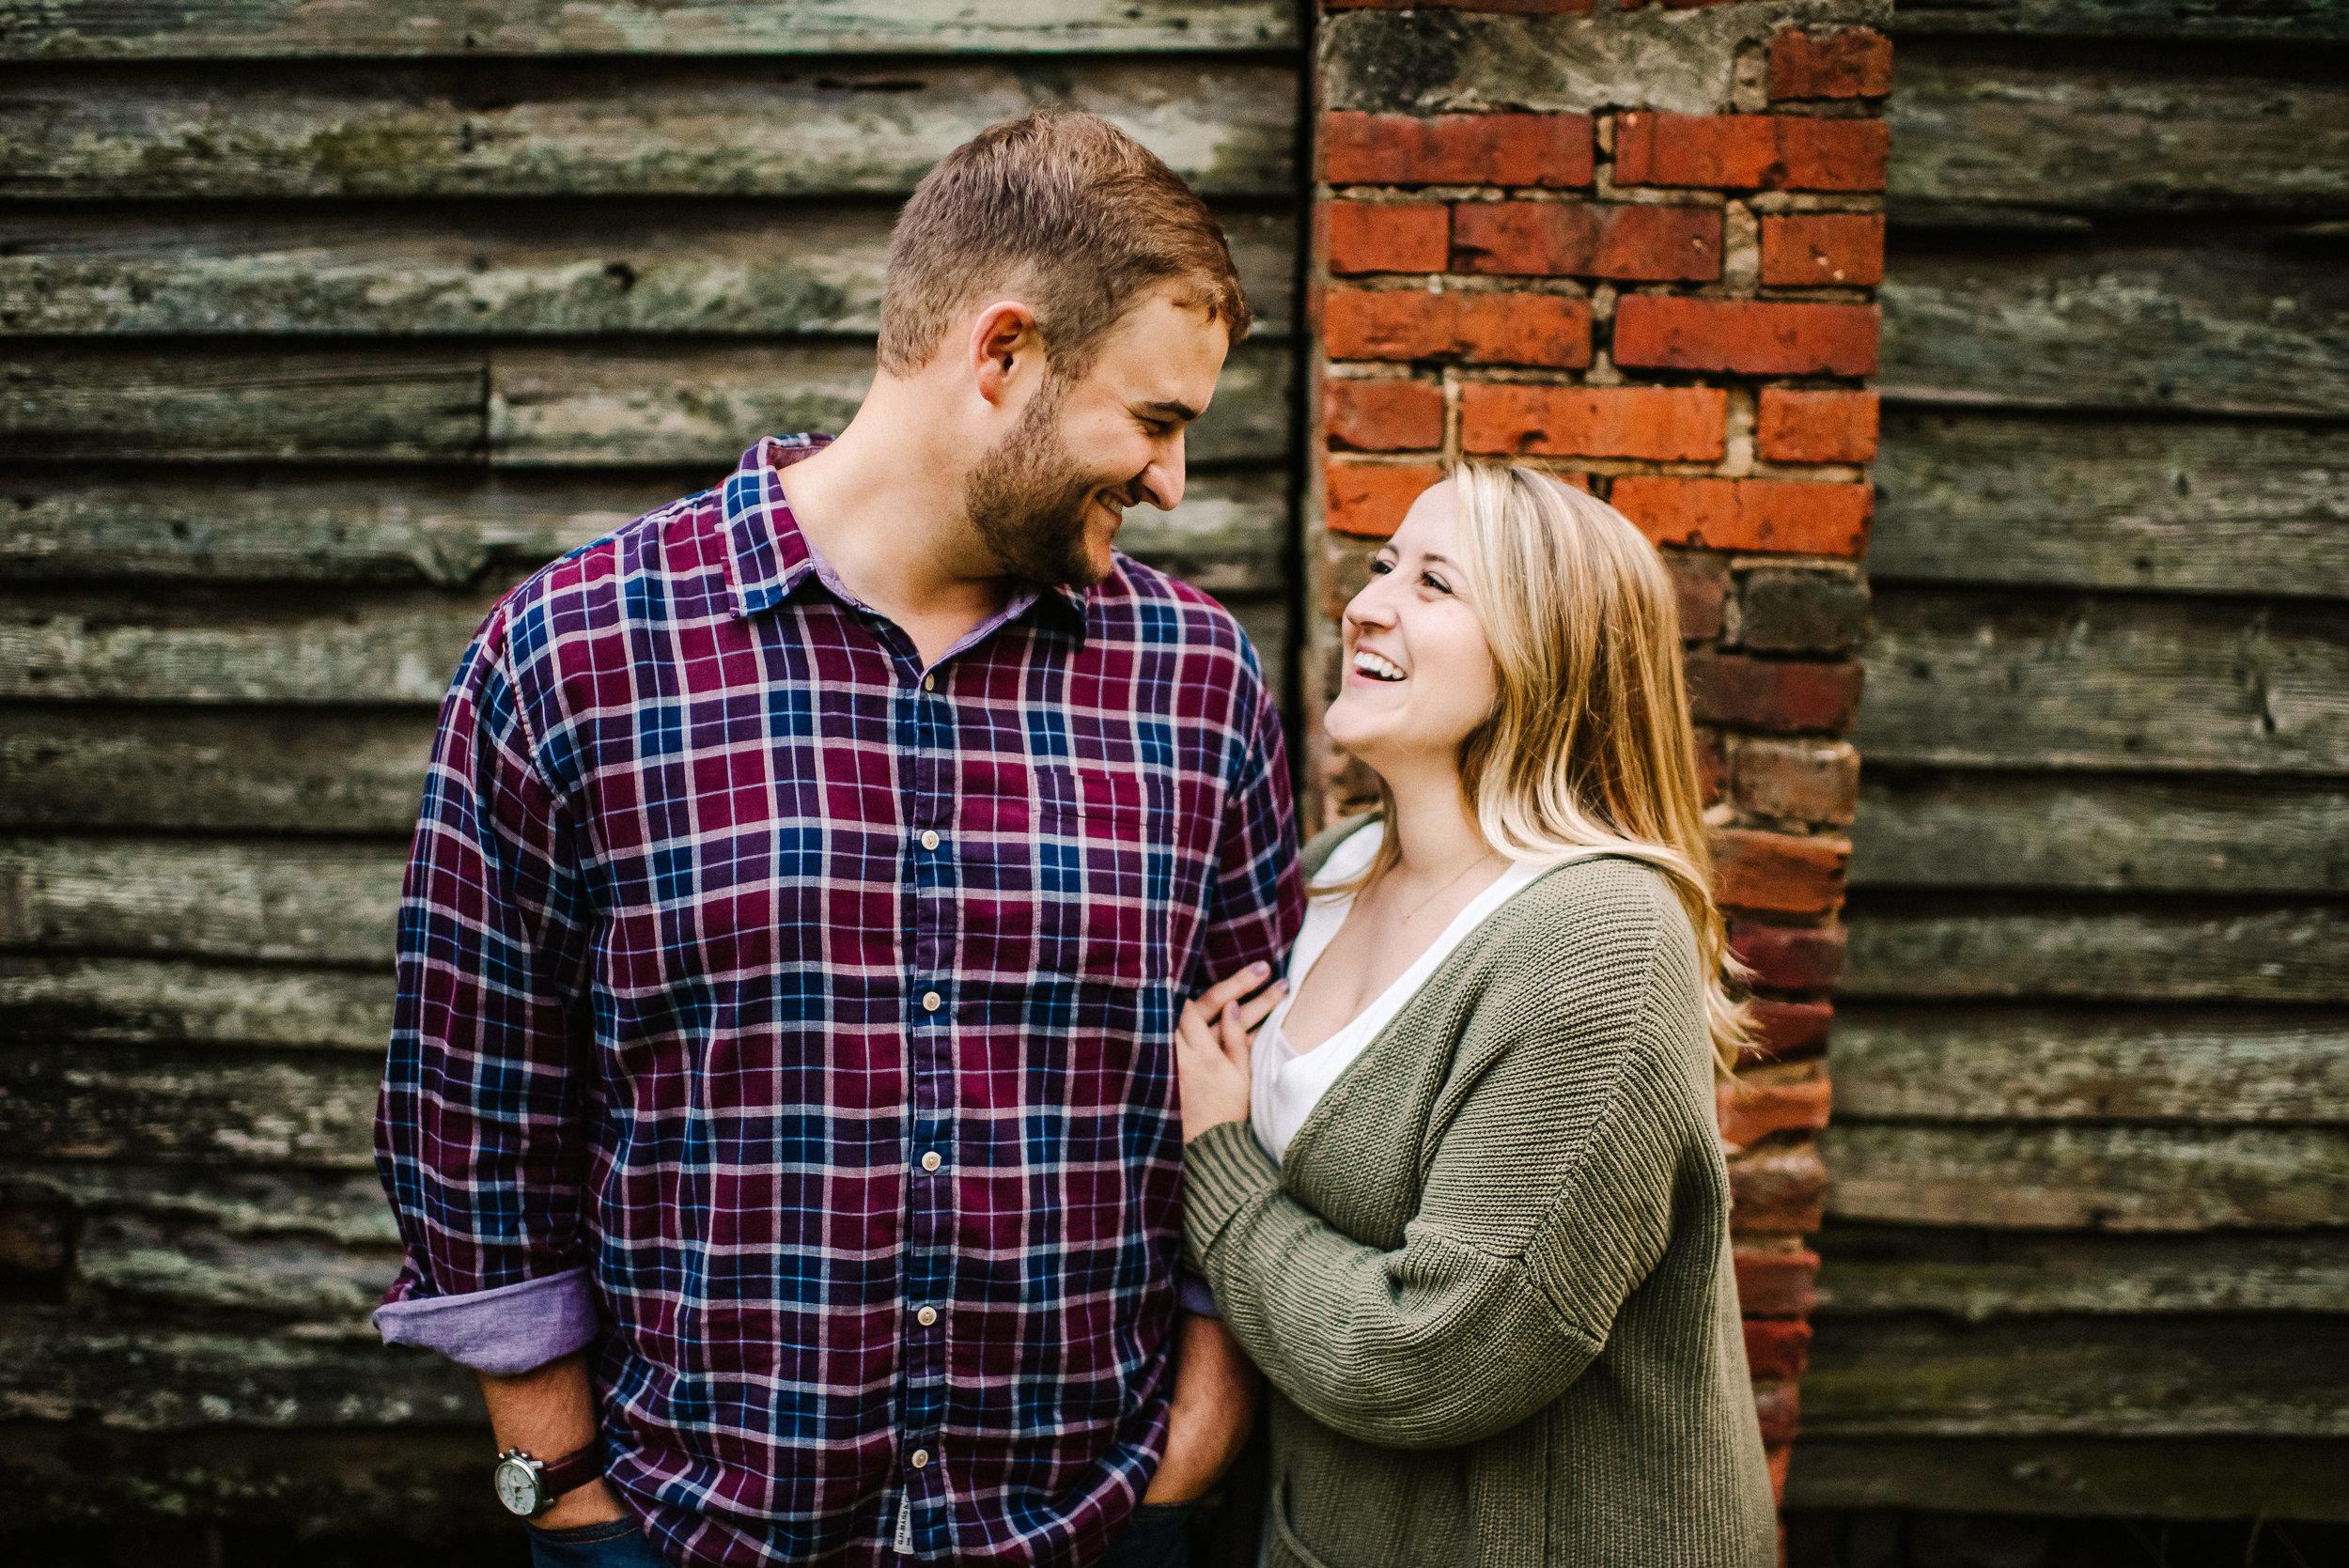 Romantic Fall Engagement Photography_Alexis & Jacob_Ashley Benham Photography-155.jpg